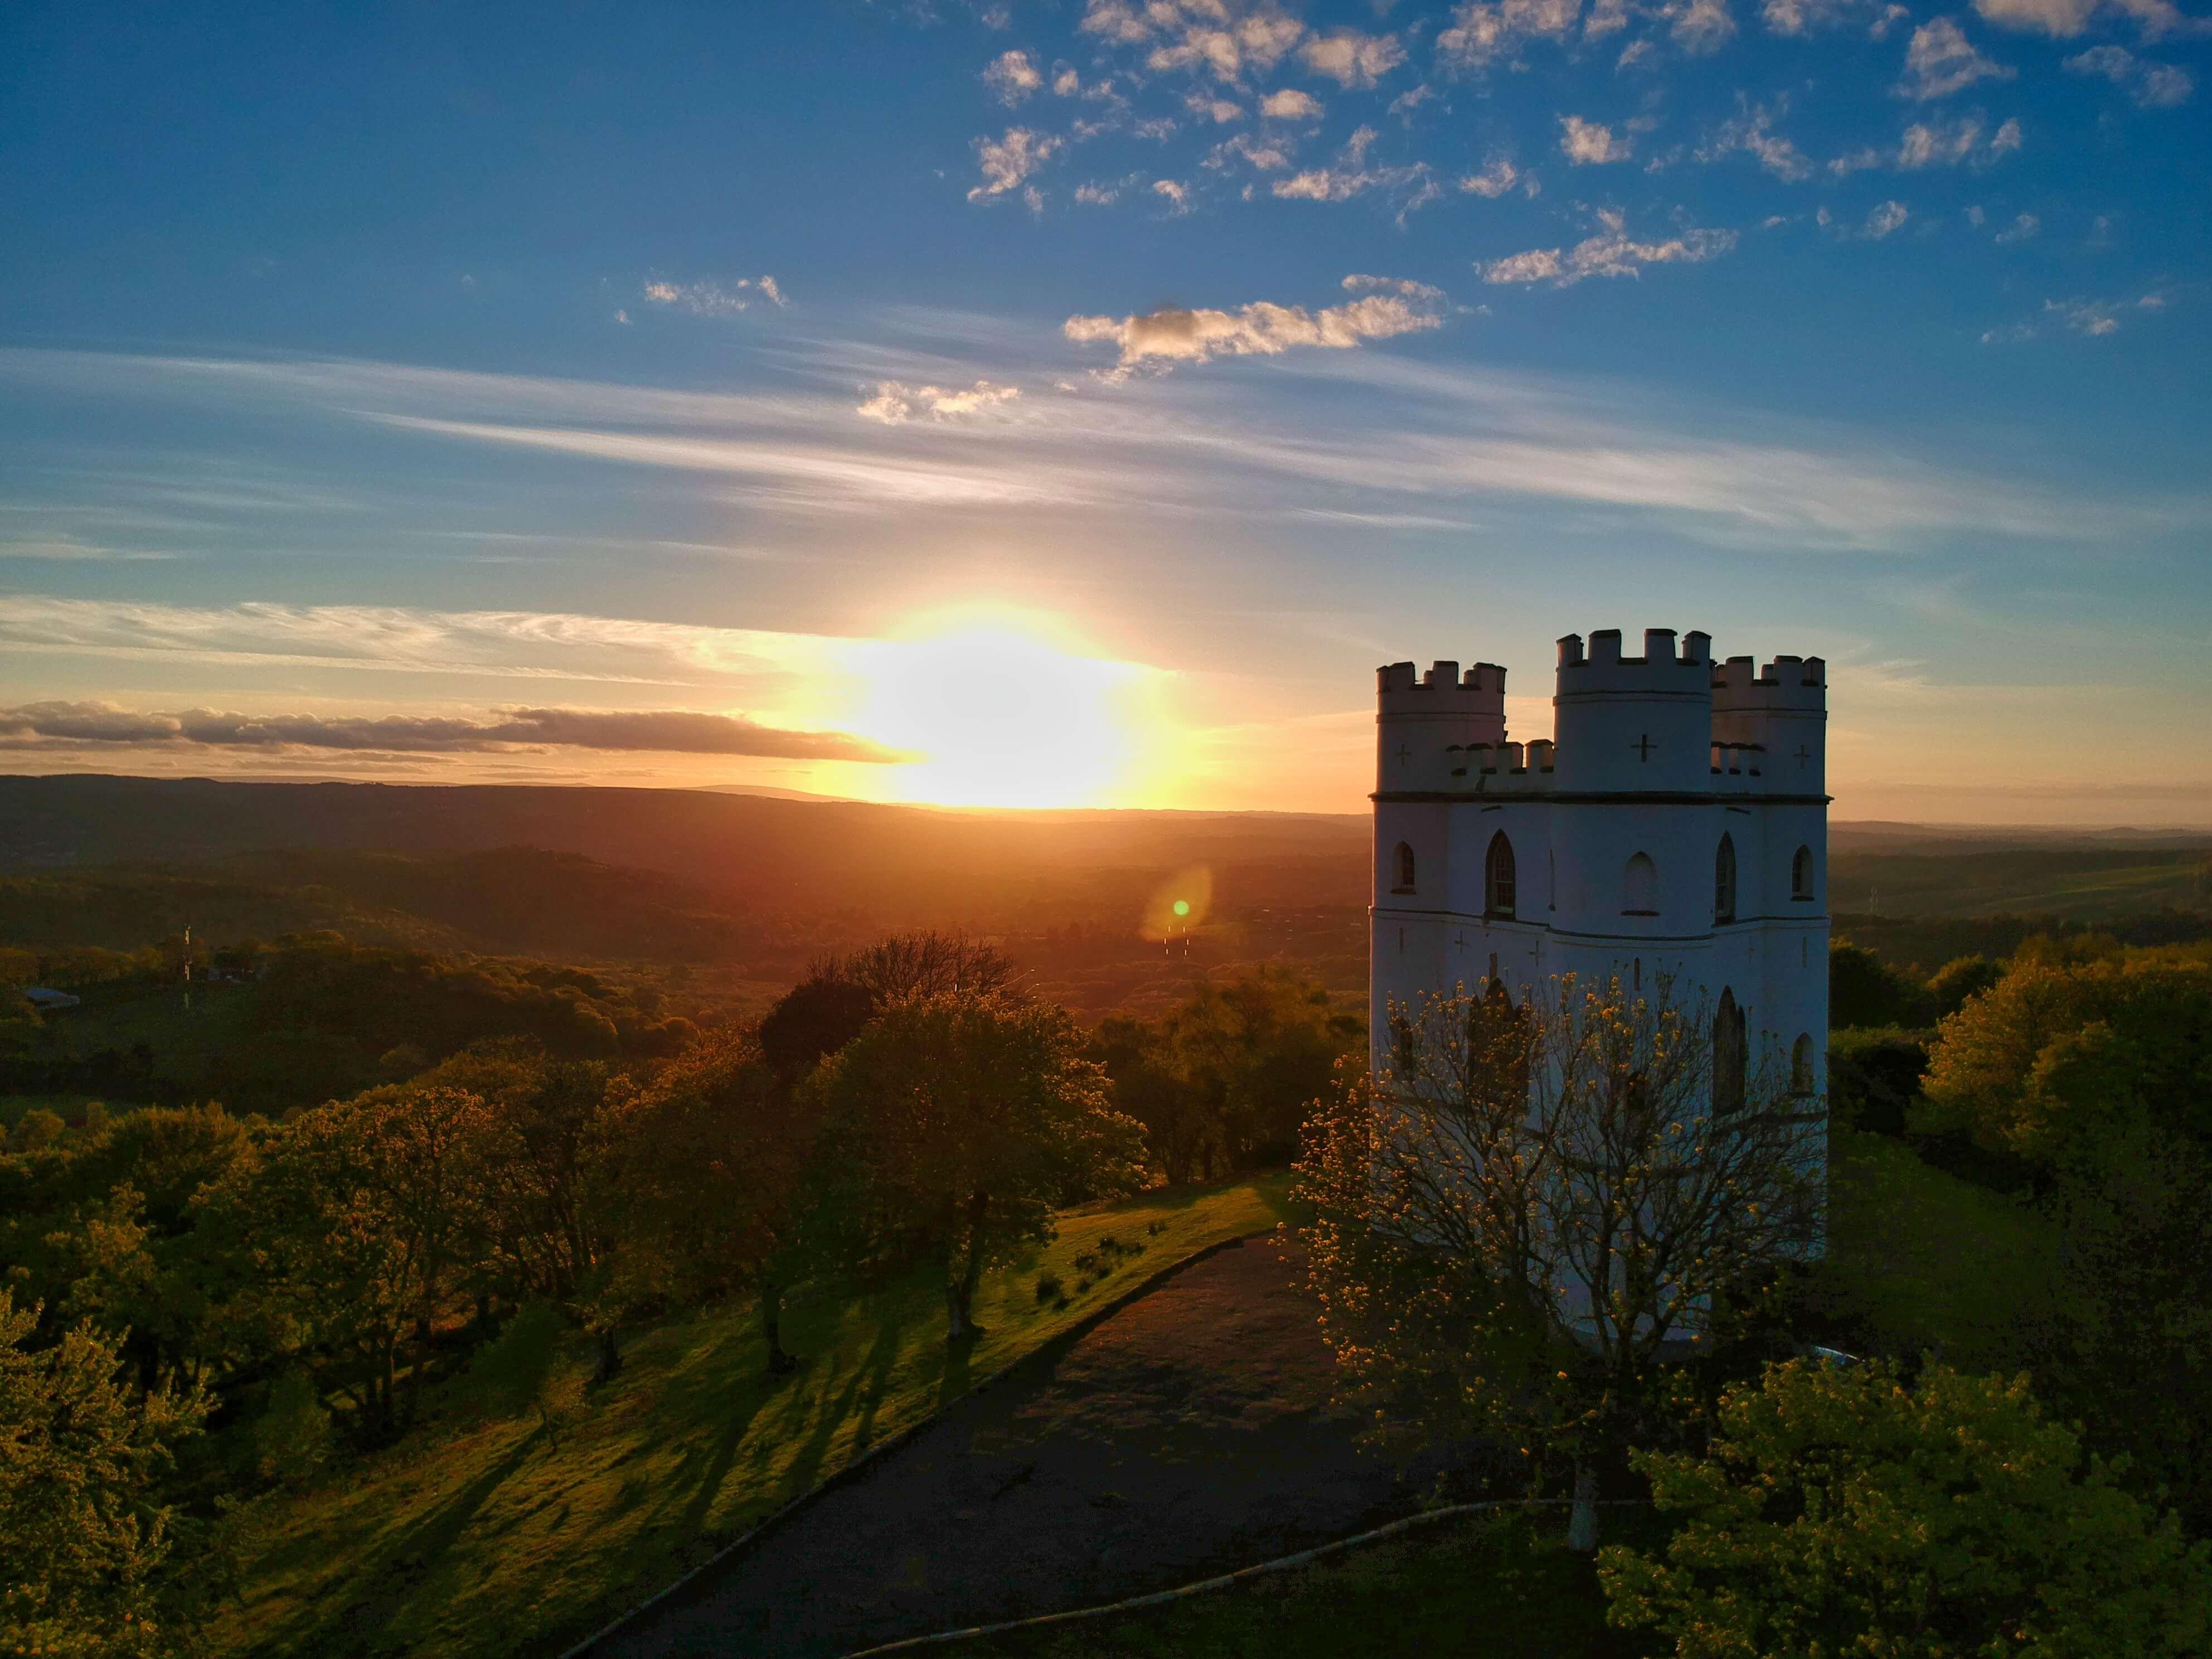 castle in Dorset